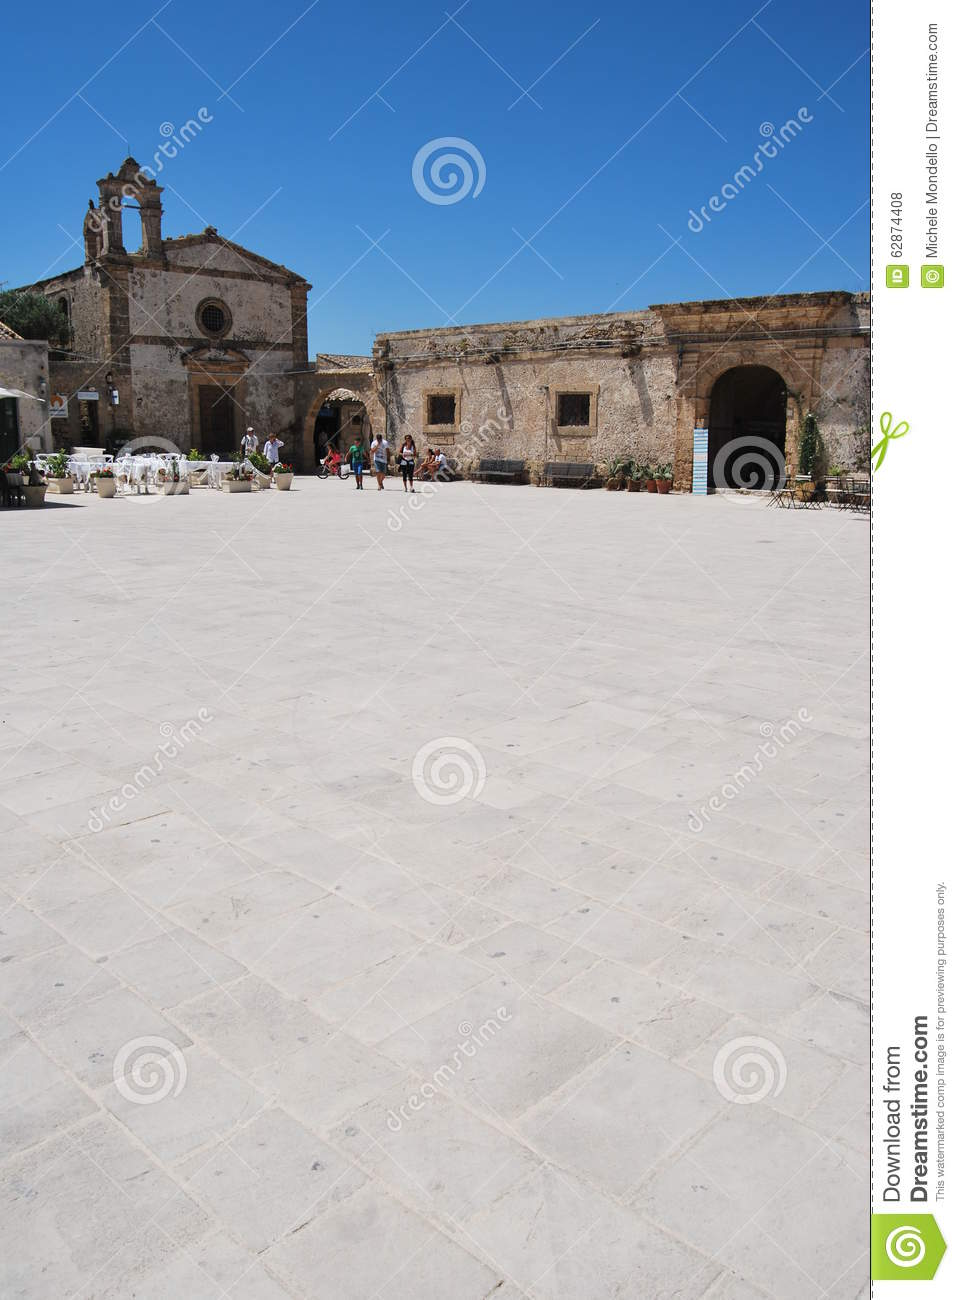 Old Village Of Marzamemi, Sicily, Italy Editorial Stock Photo.